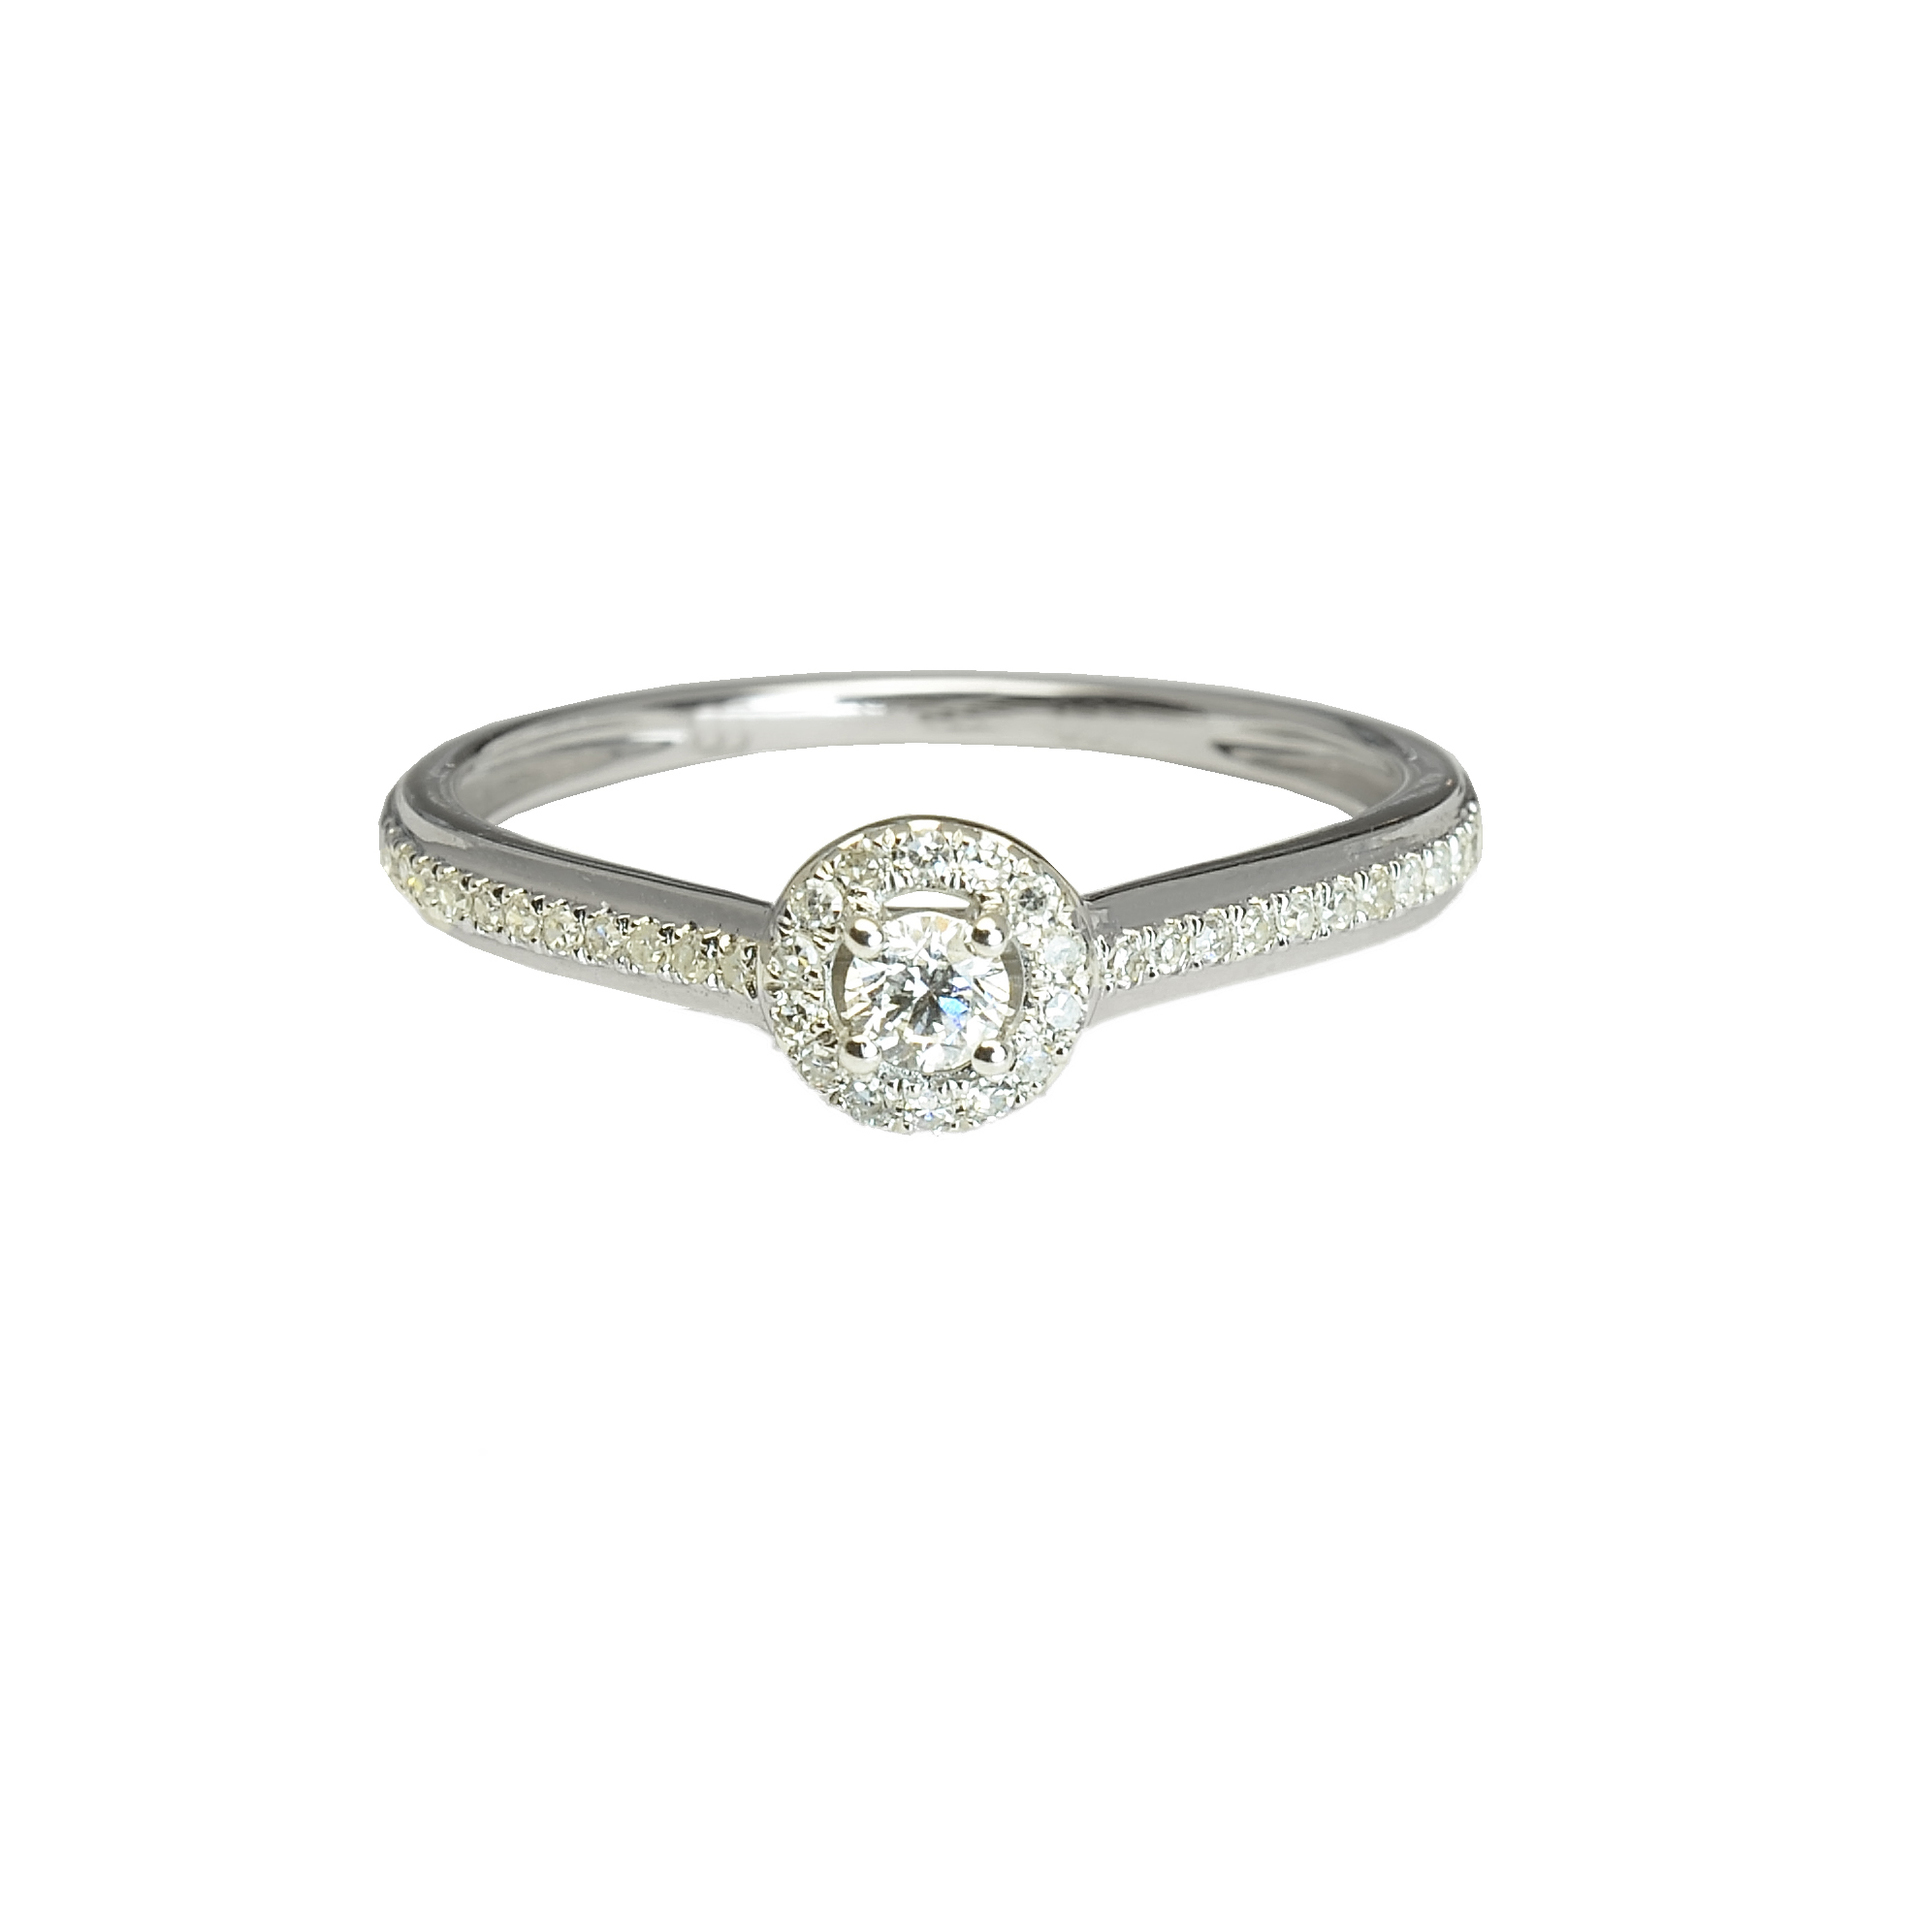 a6b00ccd6 GOLDIE - Prstene - Zlatý prsteň s diamantmi